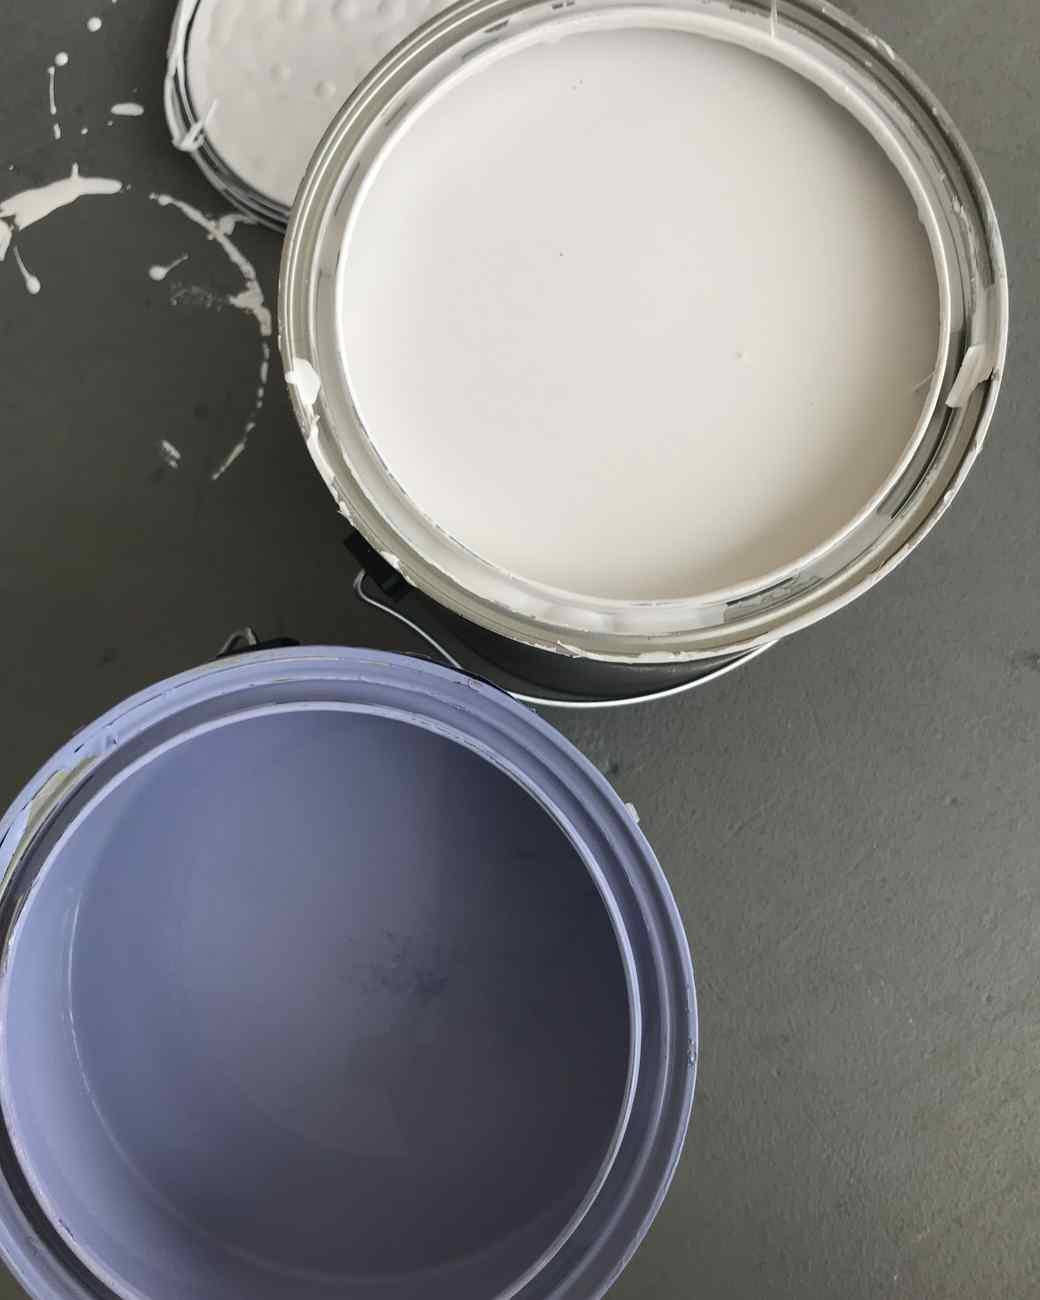 Painting Tools & Materials